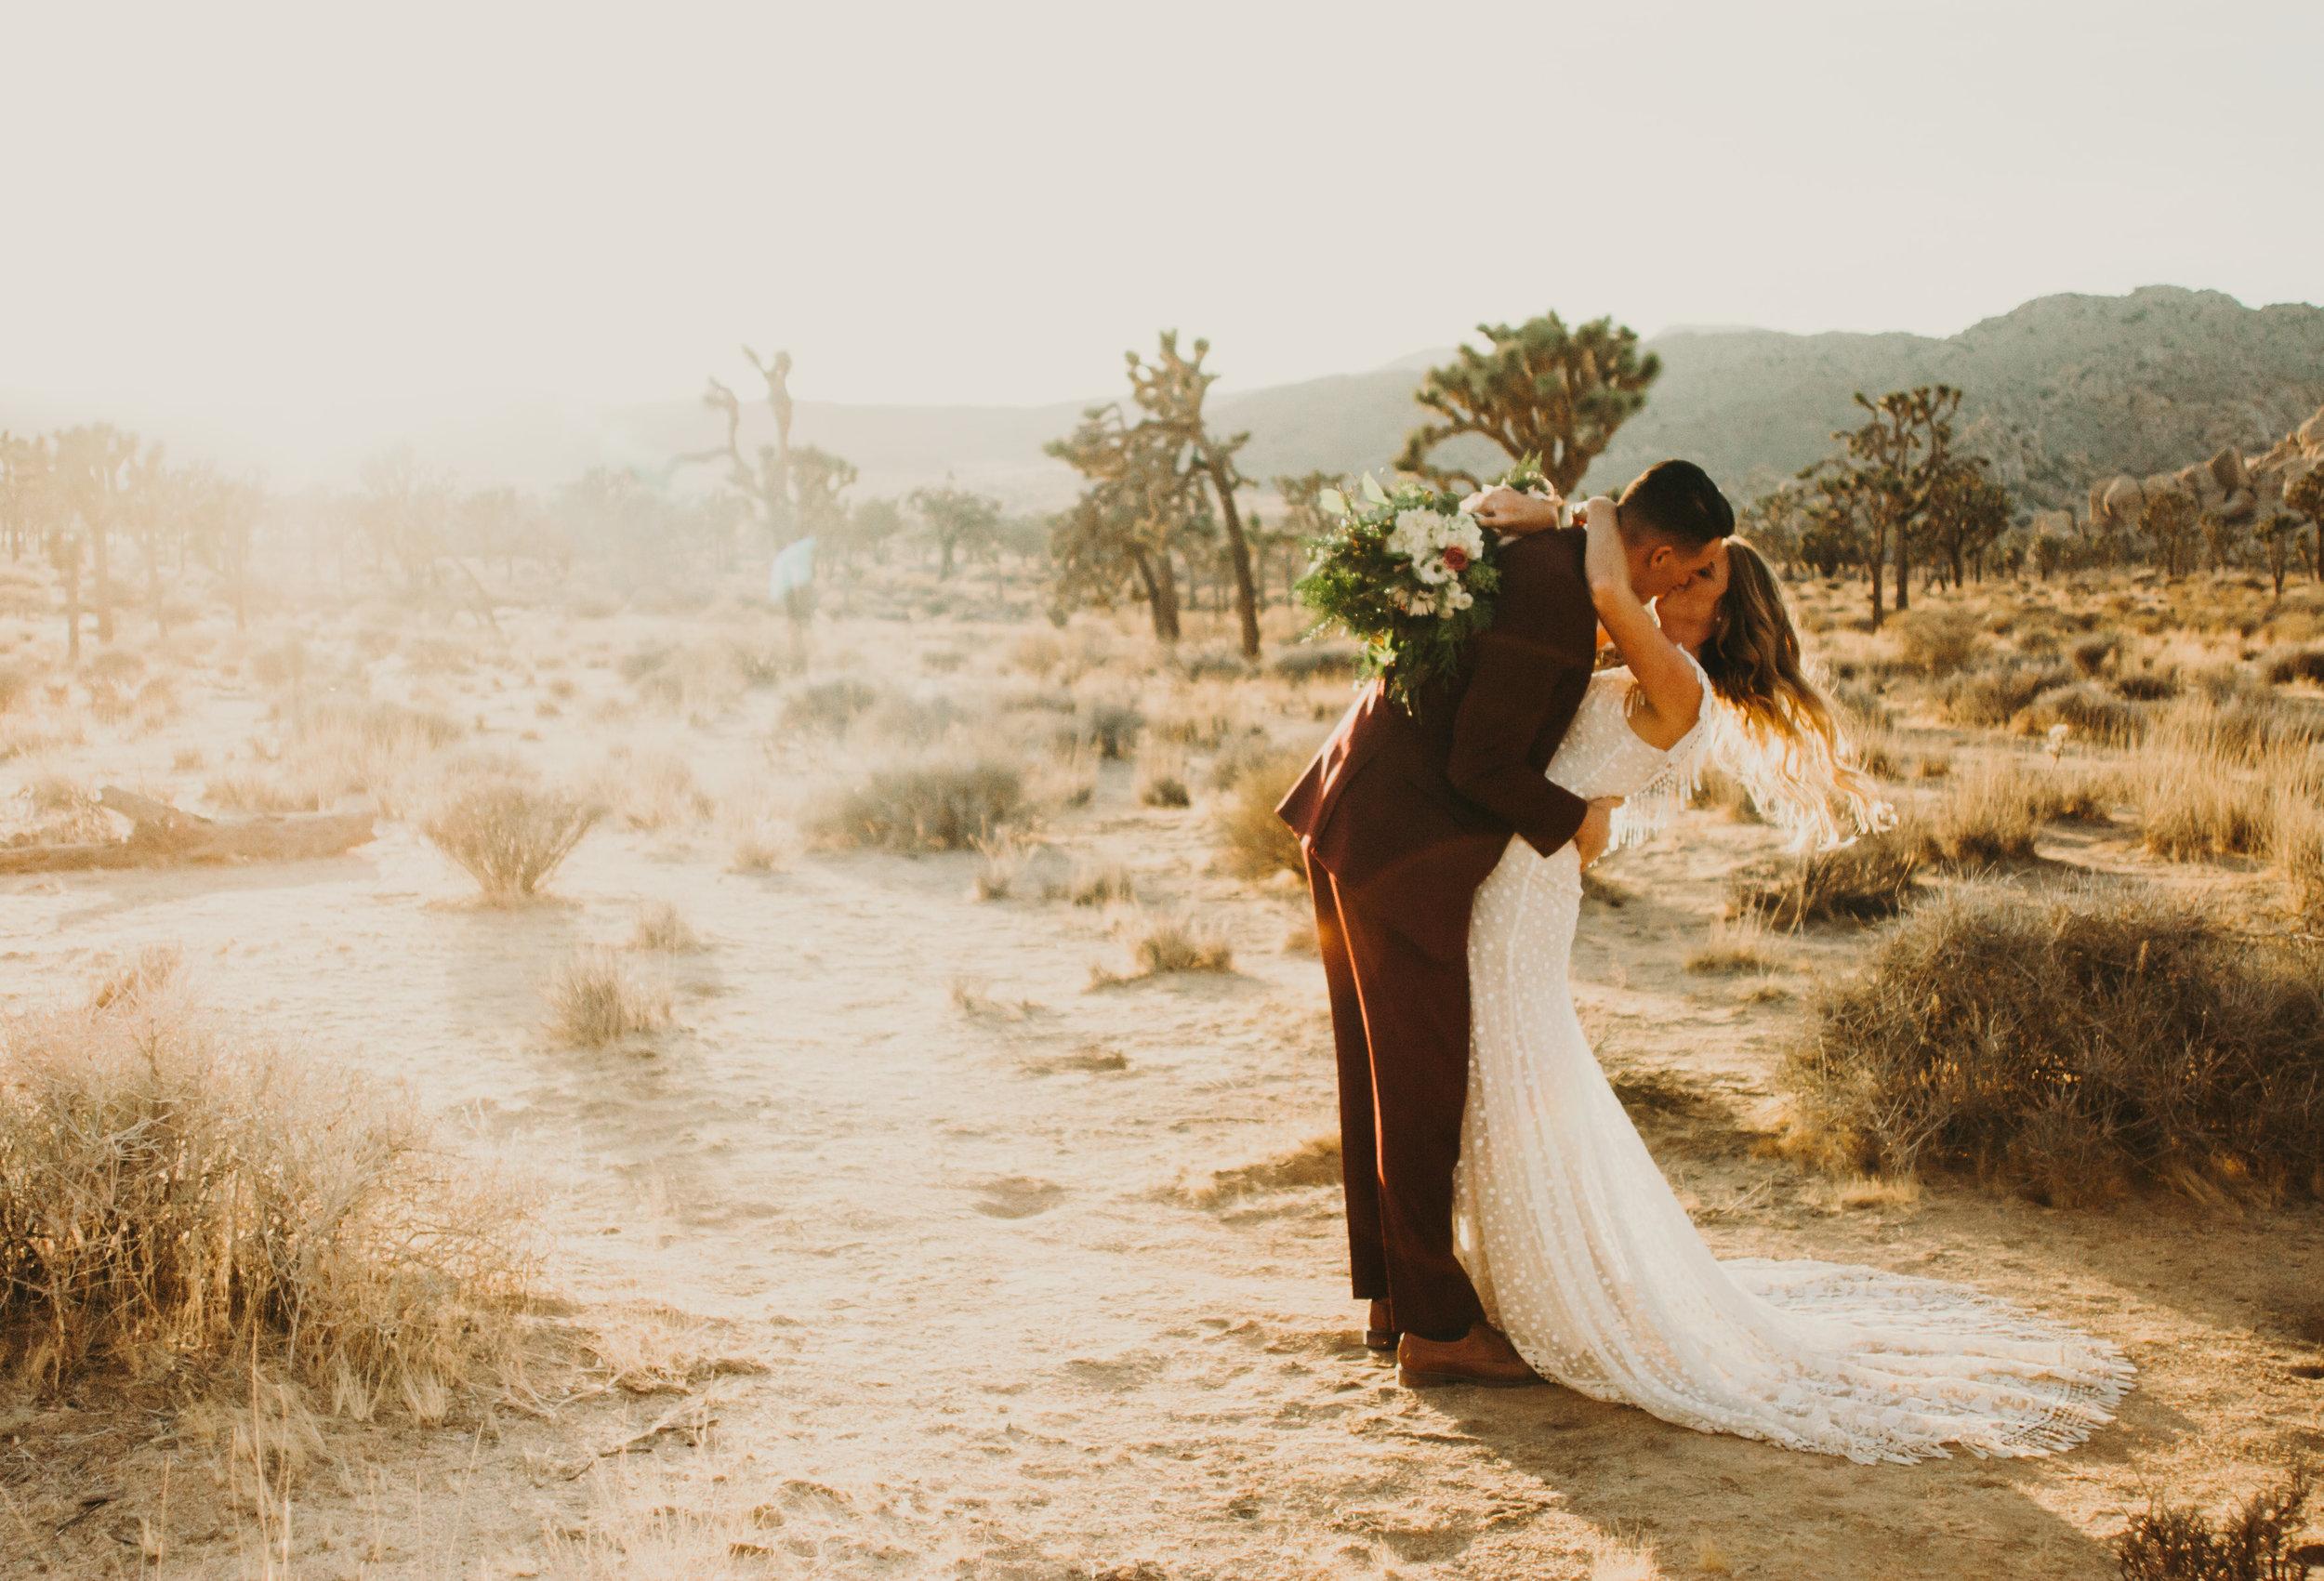 ALYSSA + STEPHEN - Styled elopement in Joshua Tree